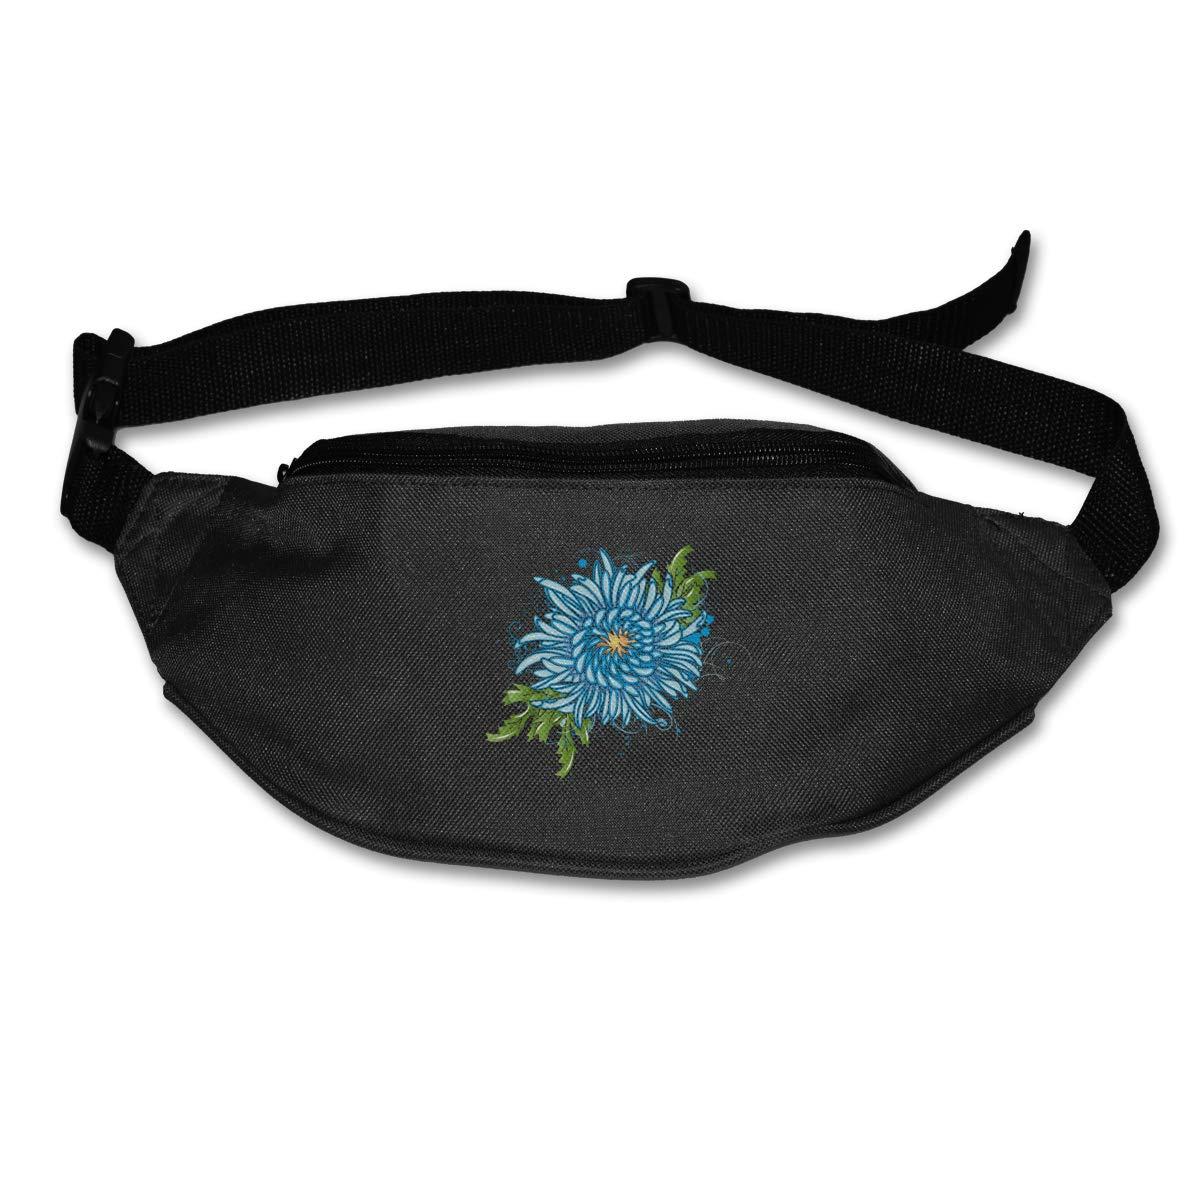 Blue Chrysanthemum Sport Waist Packs Fanny Pack Adjustable For Run